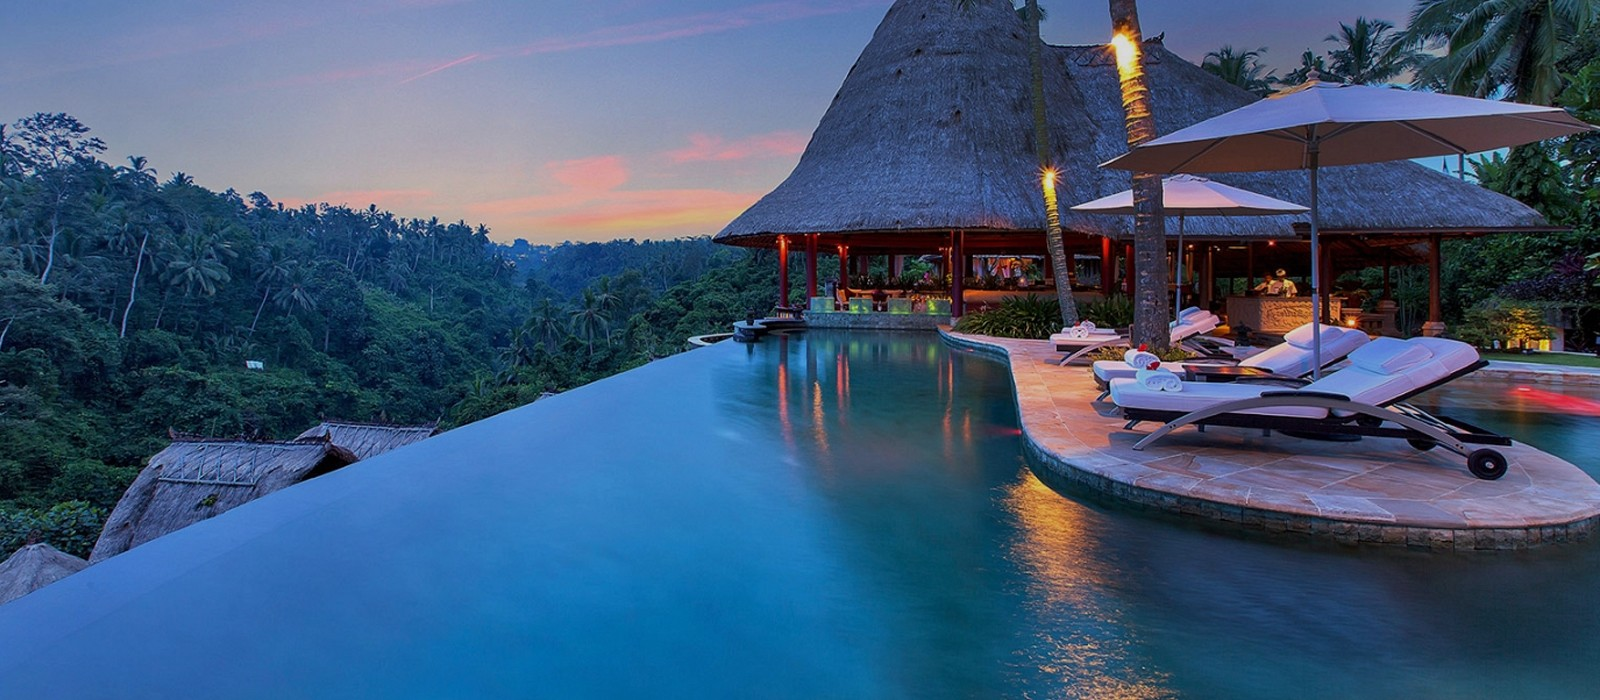 Viceroy bali bali honeymoon packages honeymoon dreams for The bali hotel